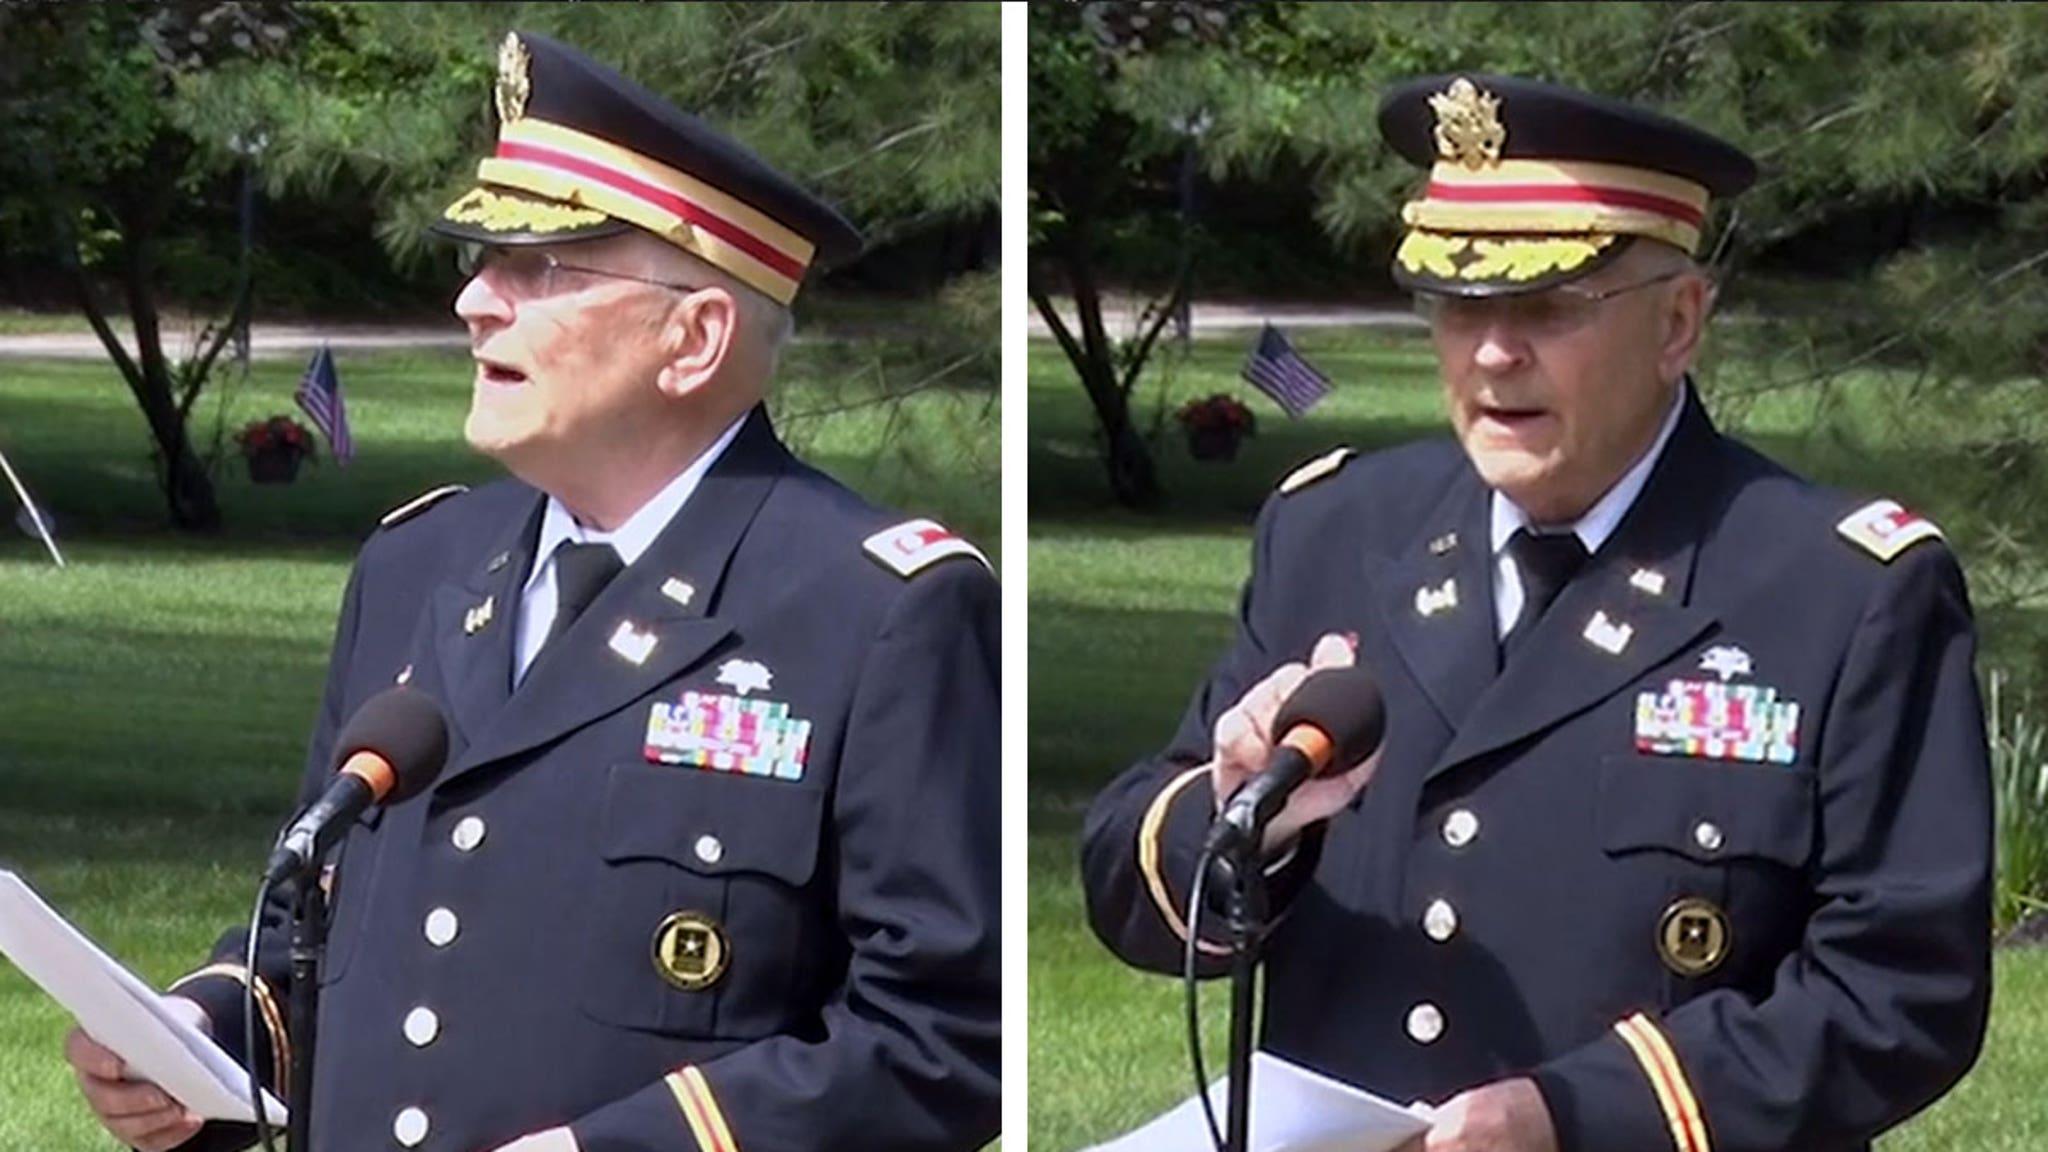 Veteran's Mic Cut During Black History Speech, Sparks Call for Resignations thumbnail